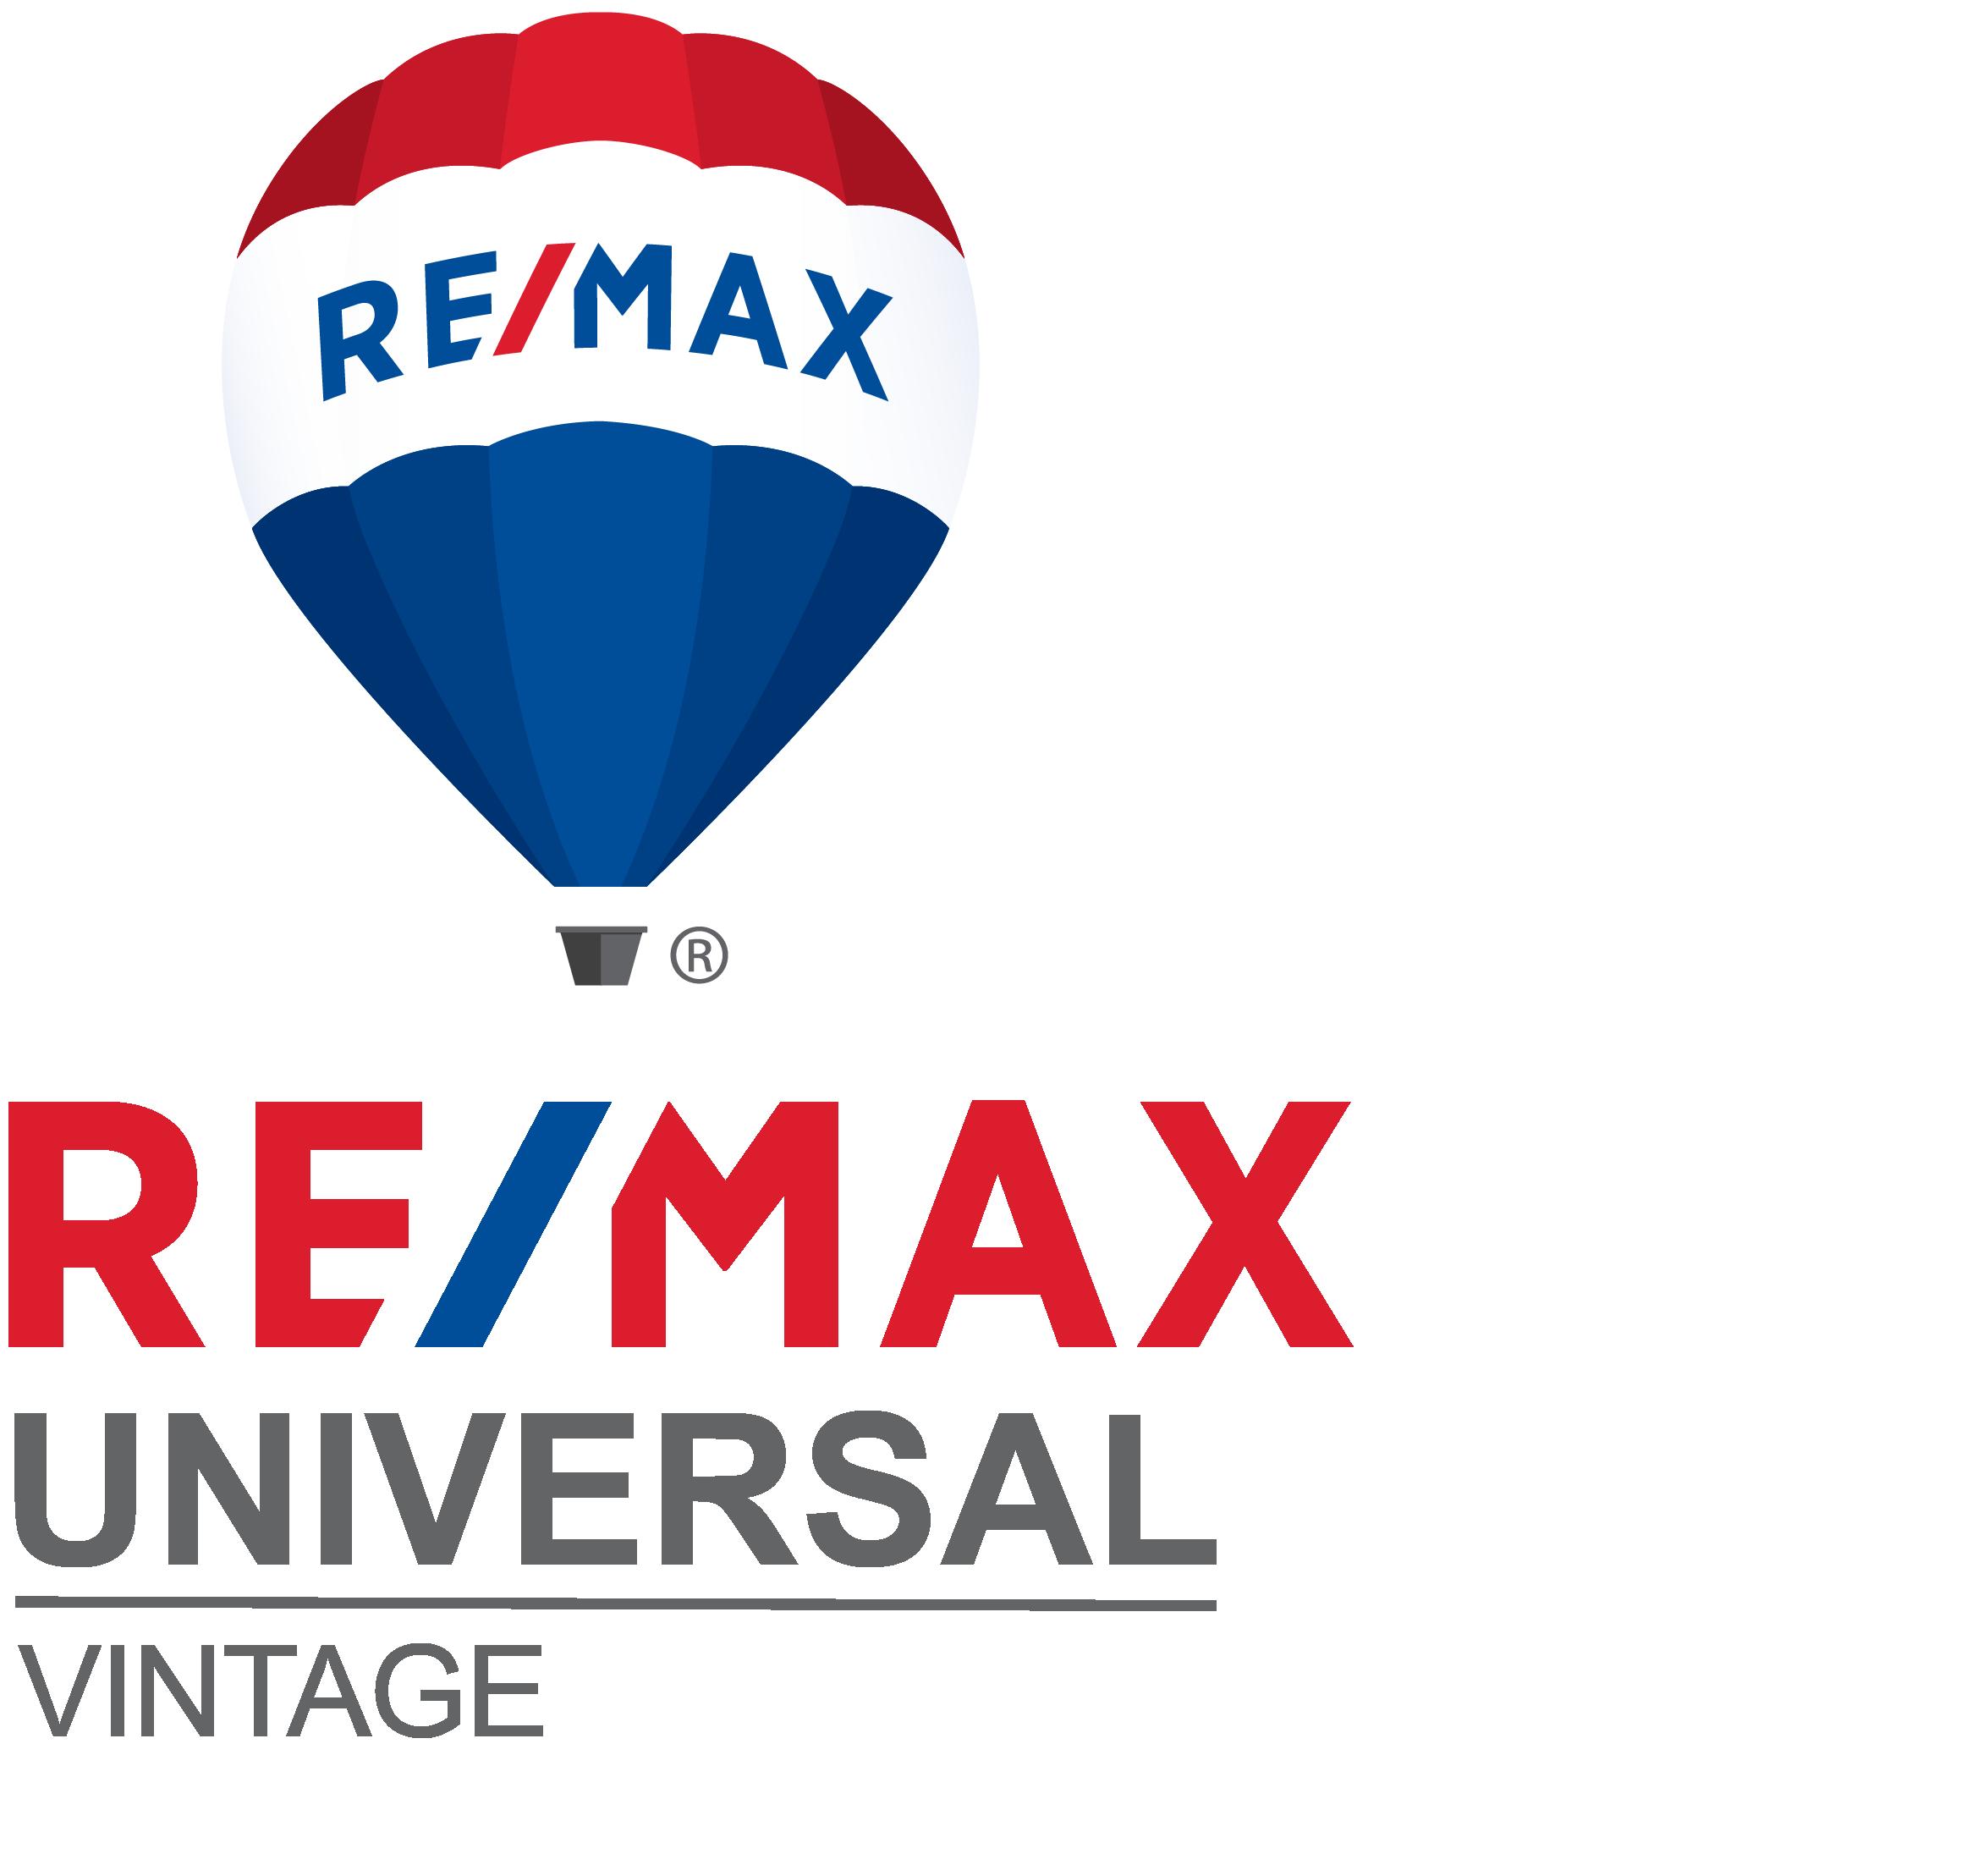 RE/MAX Vintage